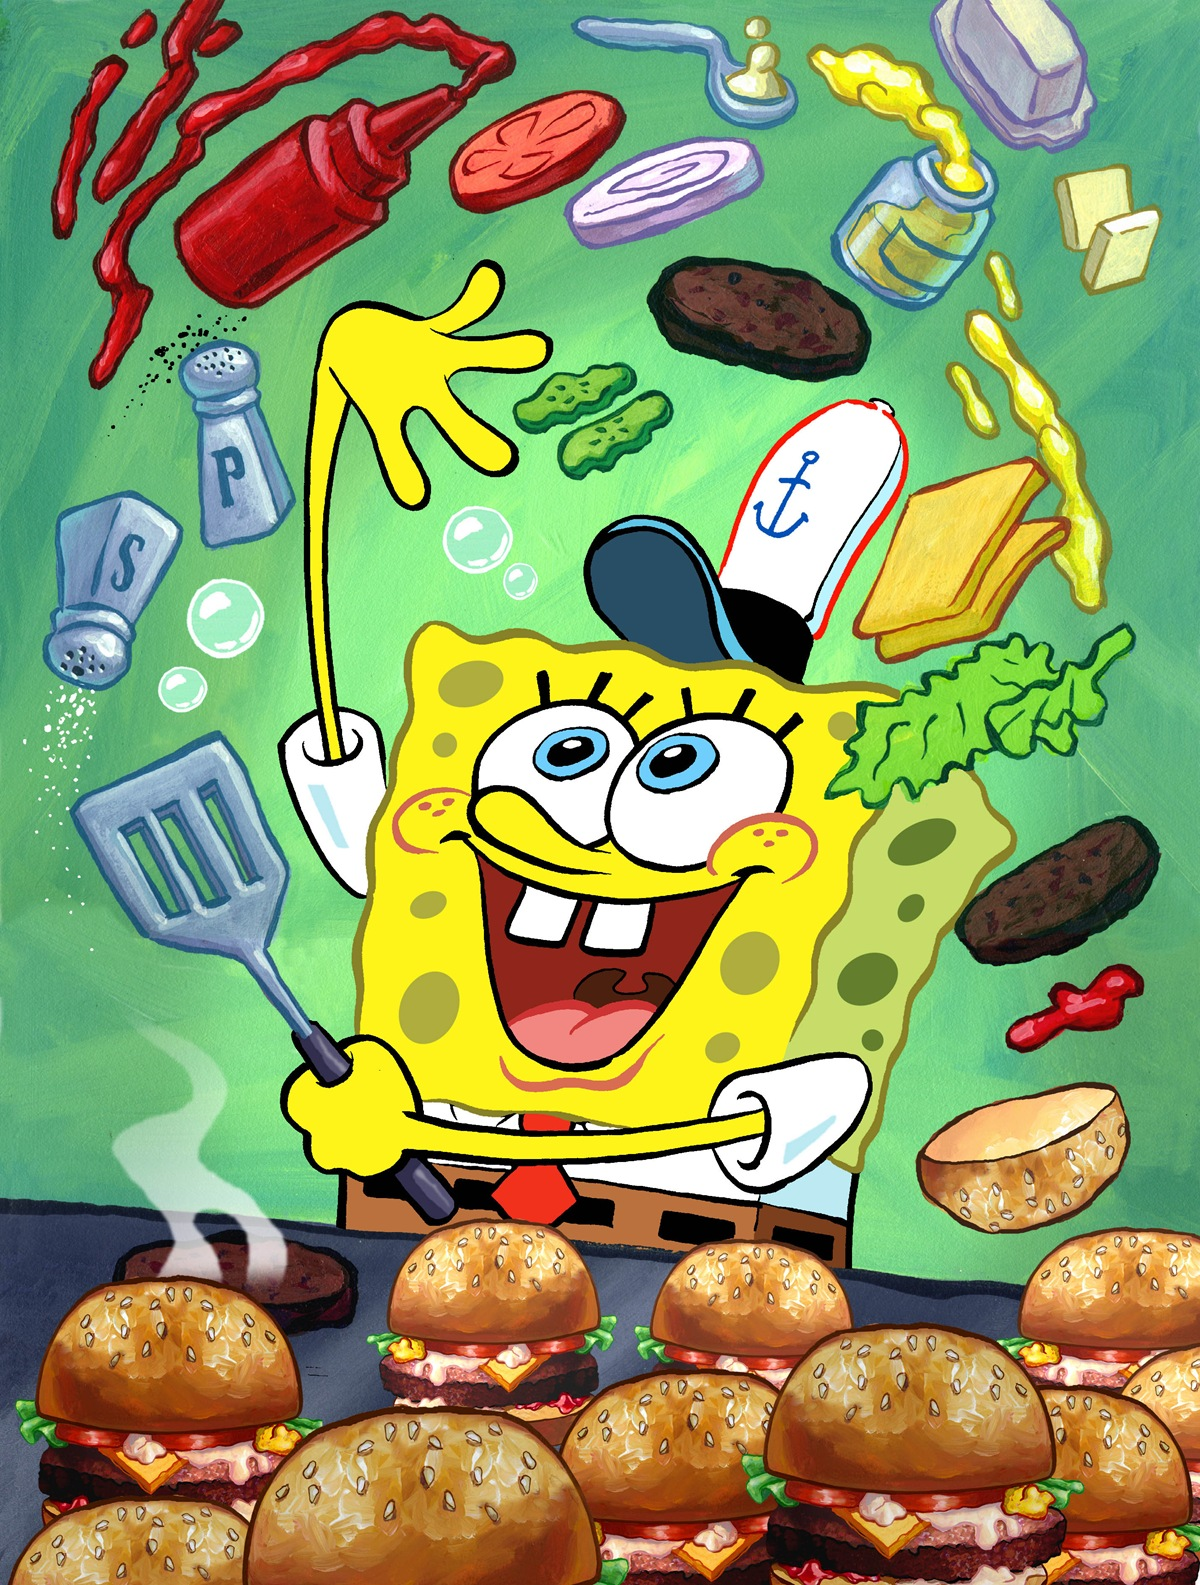 SpongeBob SquarePants - Nicktoons Toons Wars Wiki